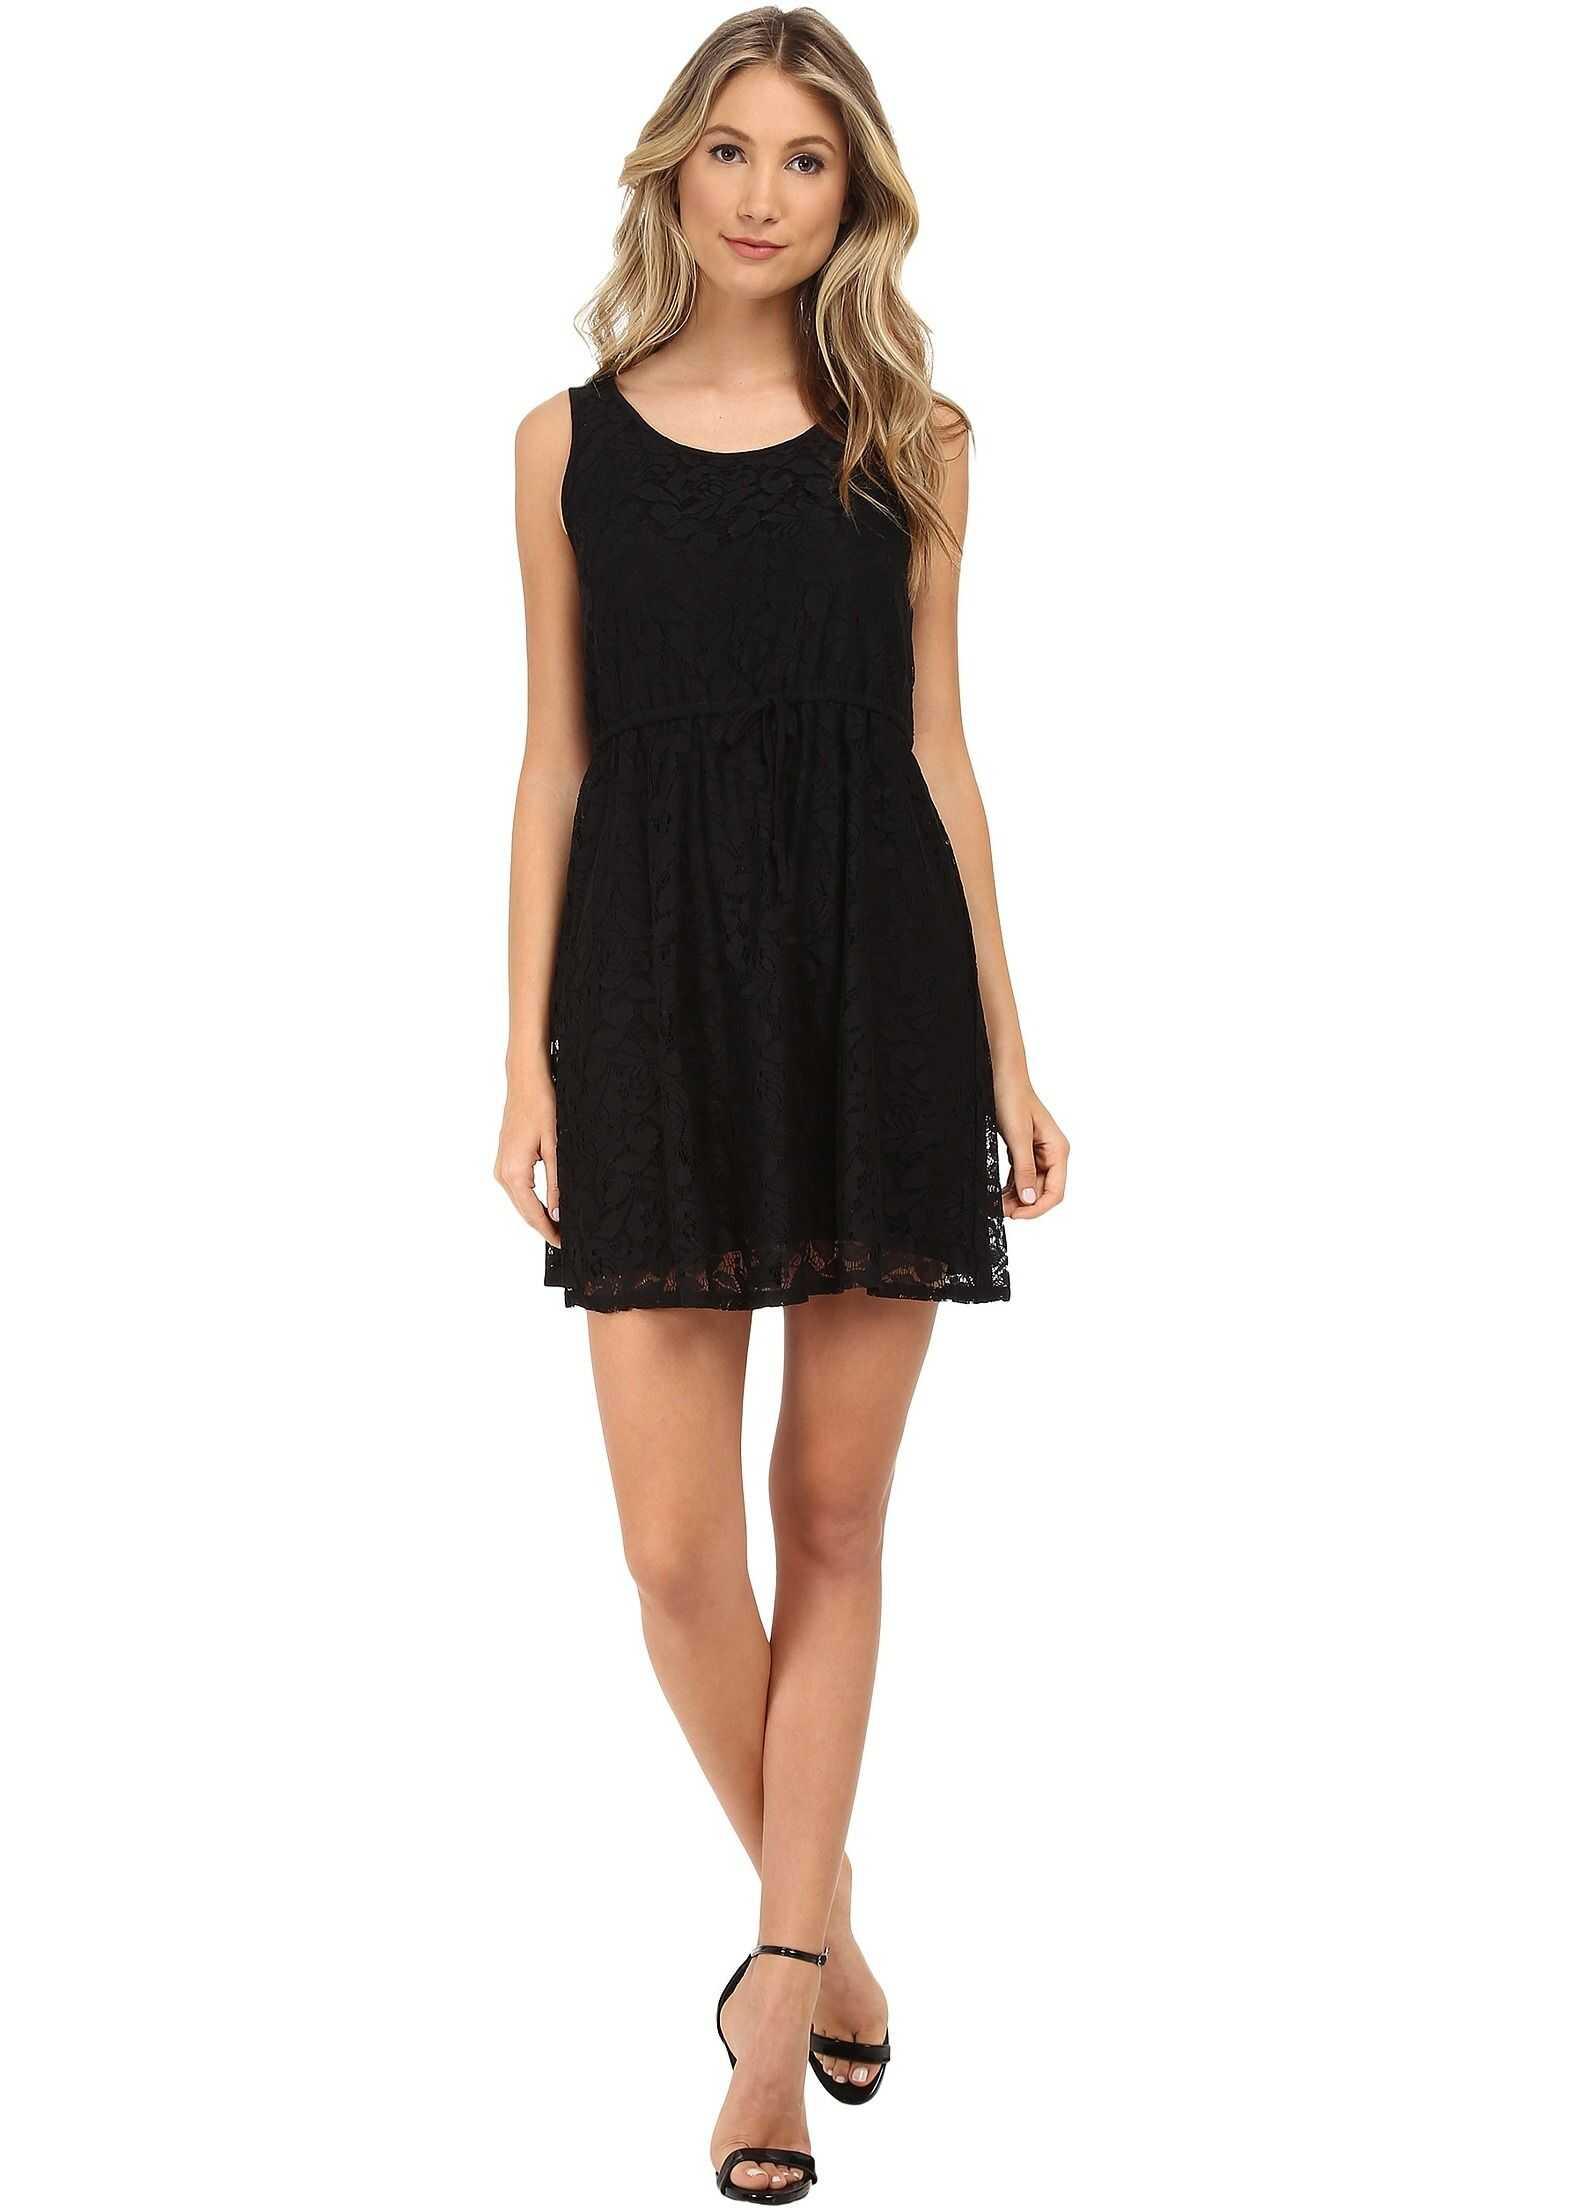 kensie Botanical Lace Dress KS5K7556* Black